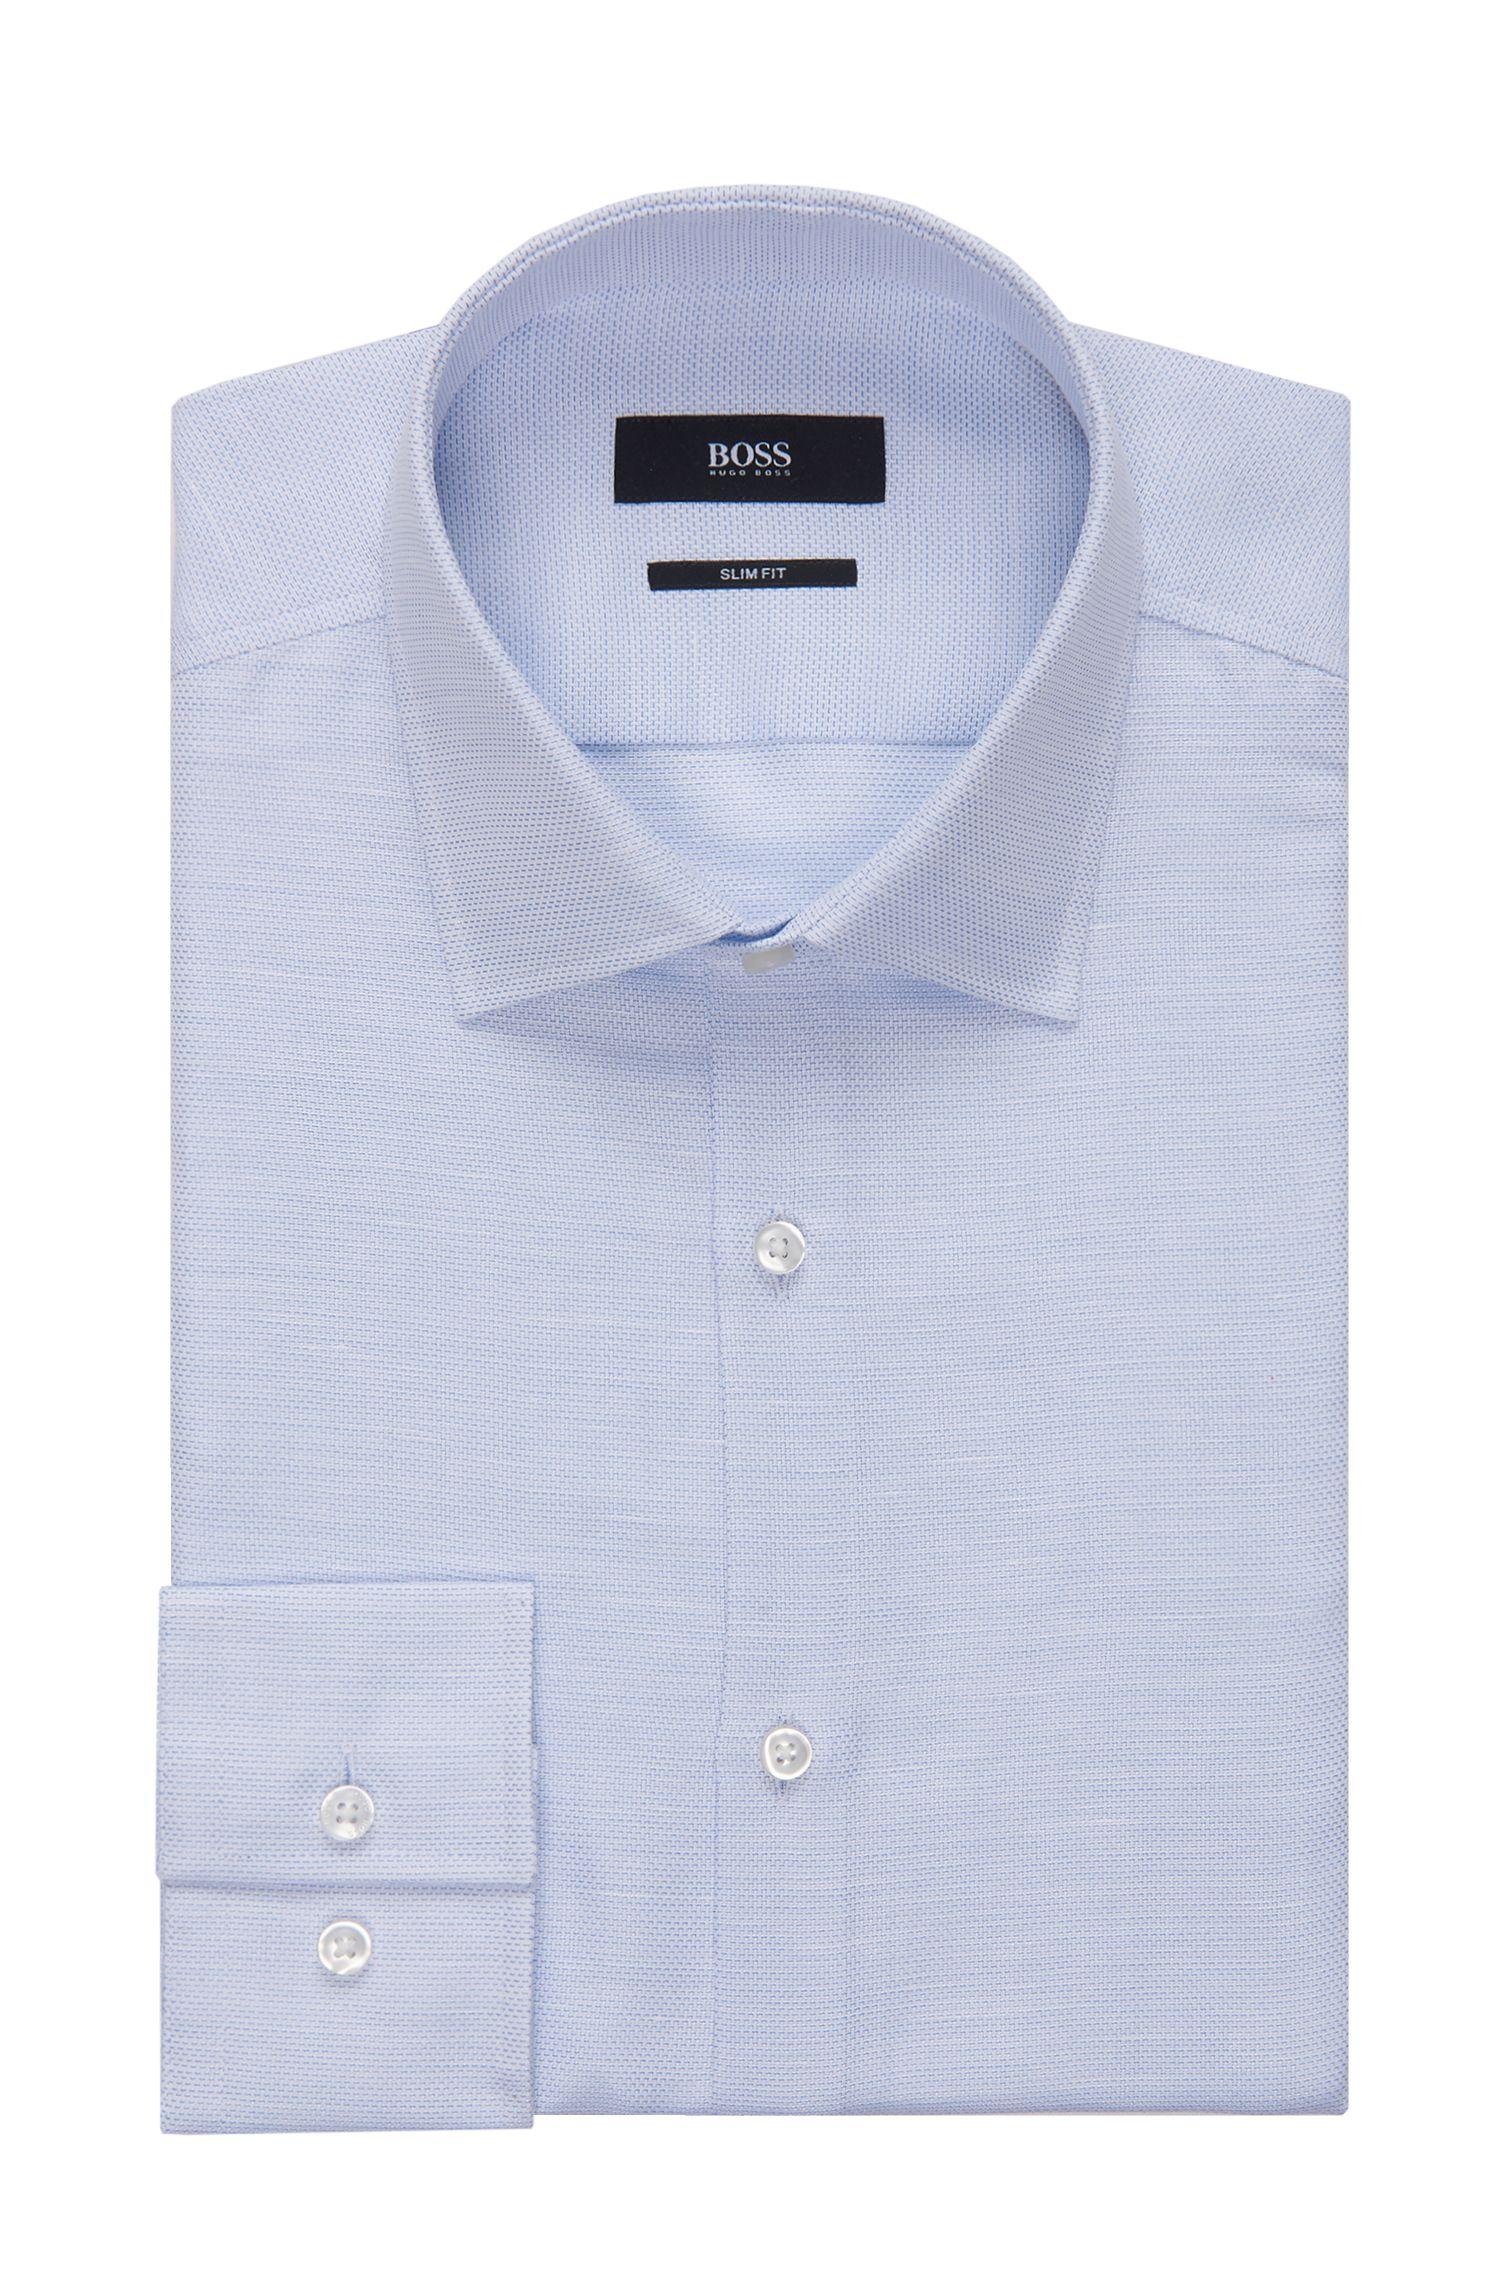 Basketweave Cotton-Linen Dress Shirt, Slim Fit | Jenno